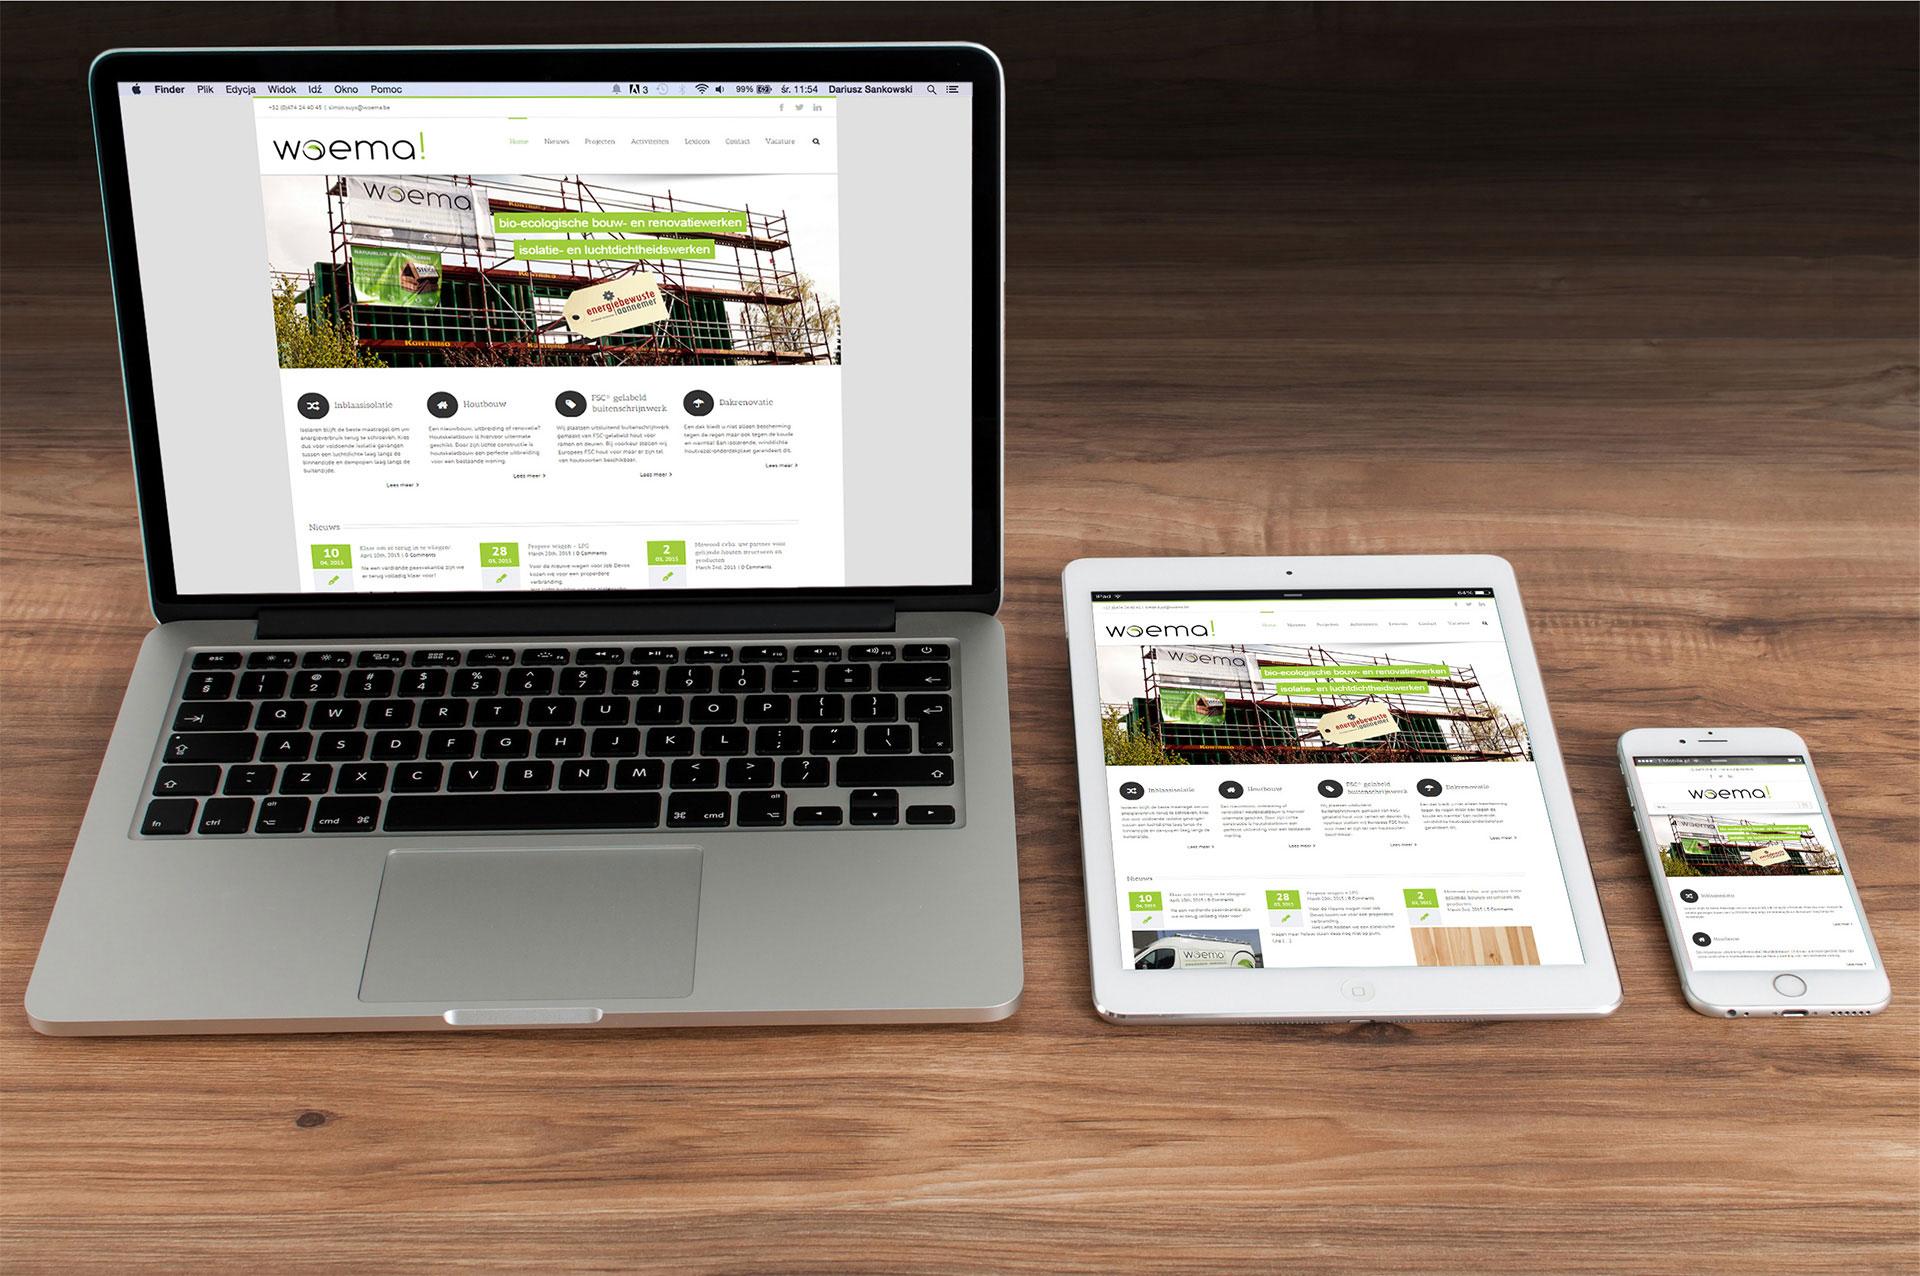 Boulevard43 Woema! responsive webdesign